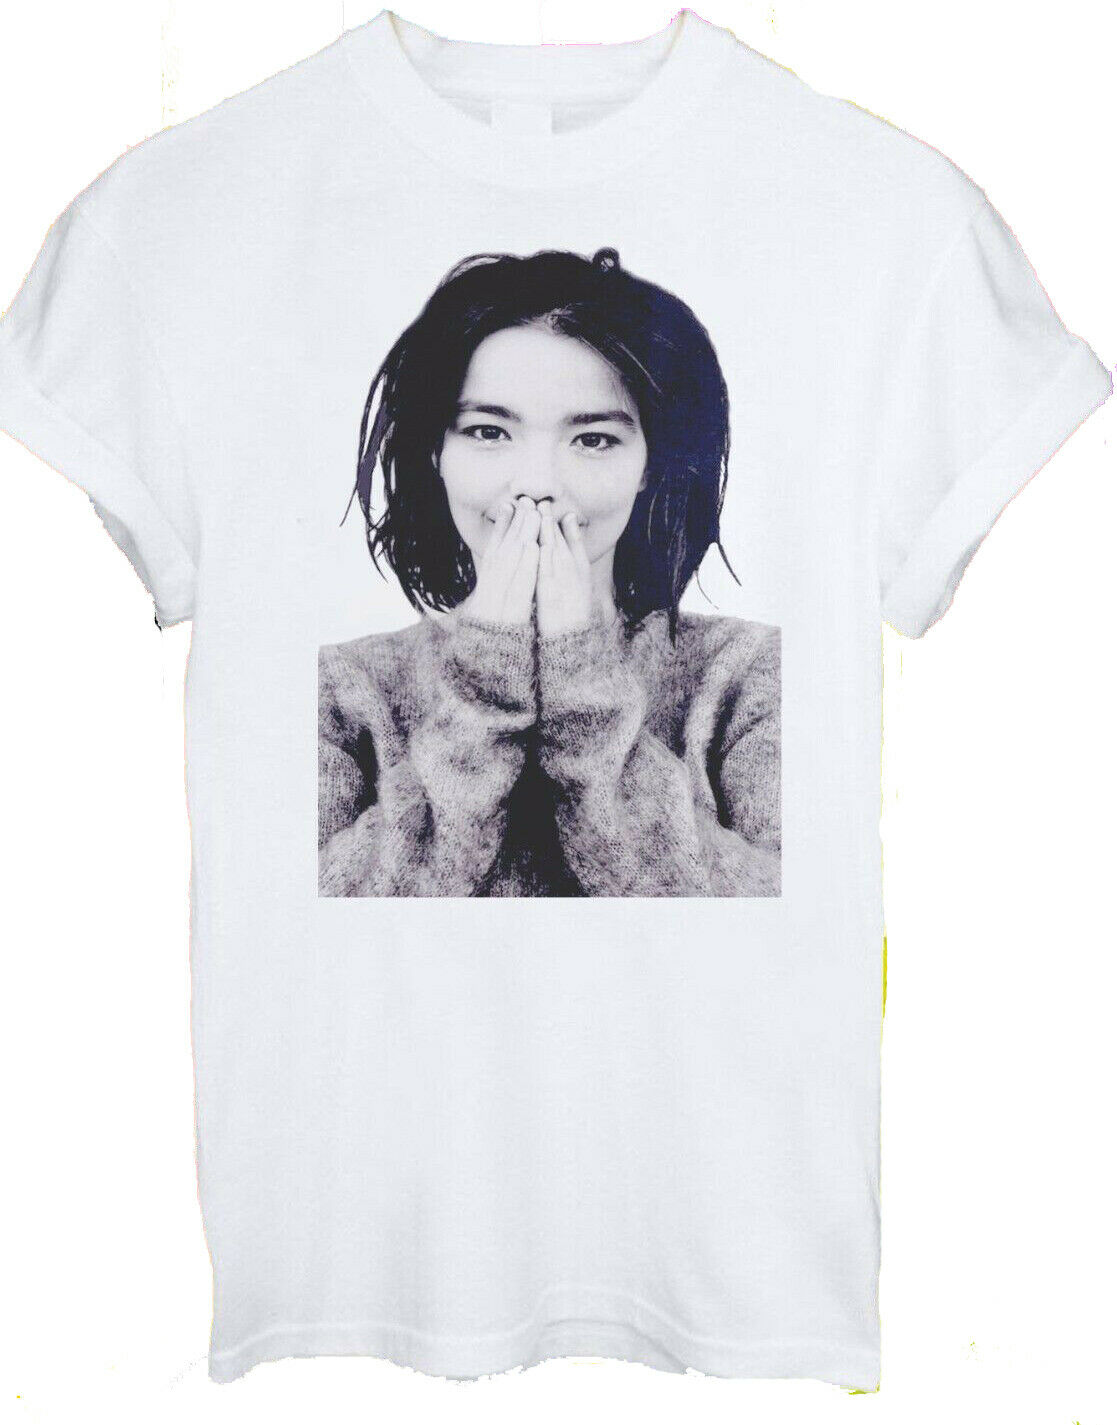 Bjork Мужская Дебютная футболка с надписью Happy Soft Fit, новинка, размеры S, M, L, Xl, 2X, 3X